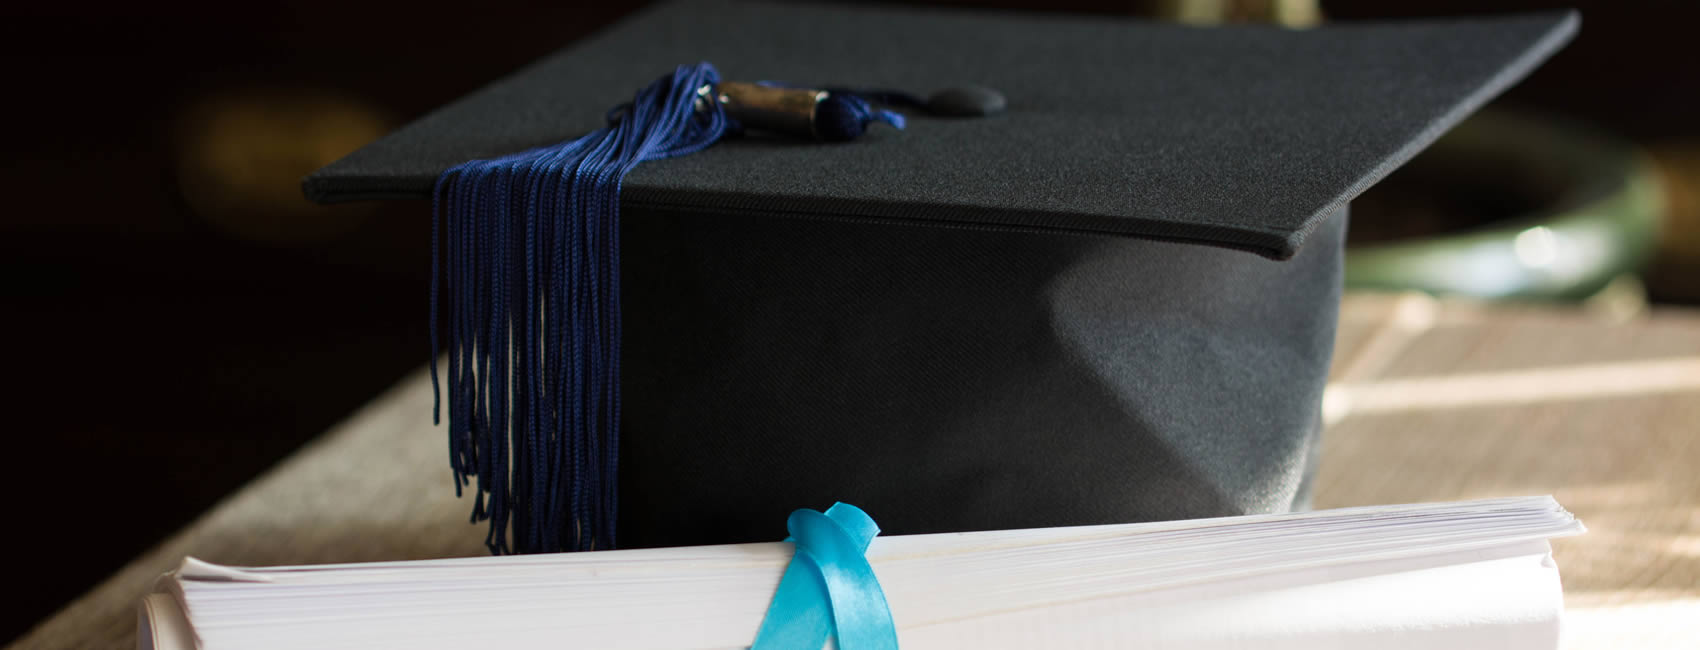 University diploma event